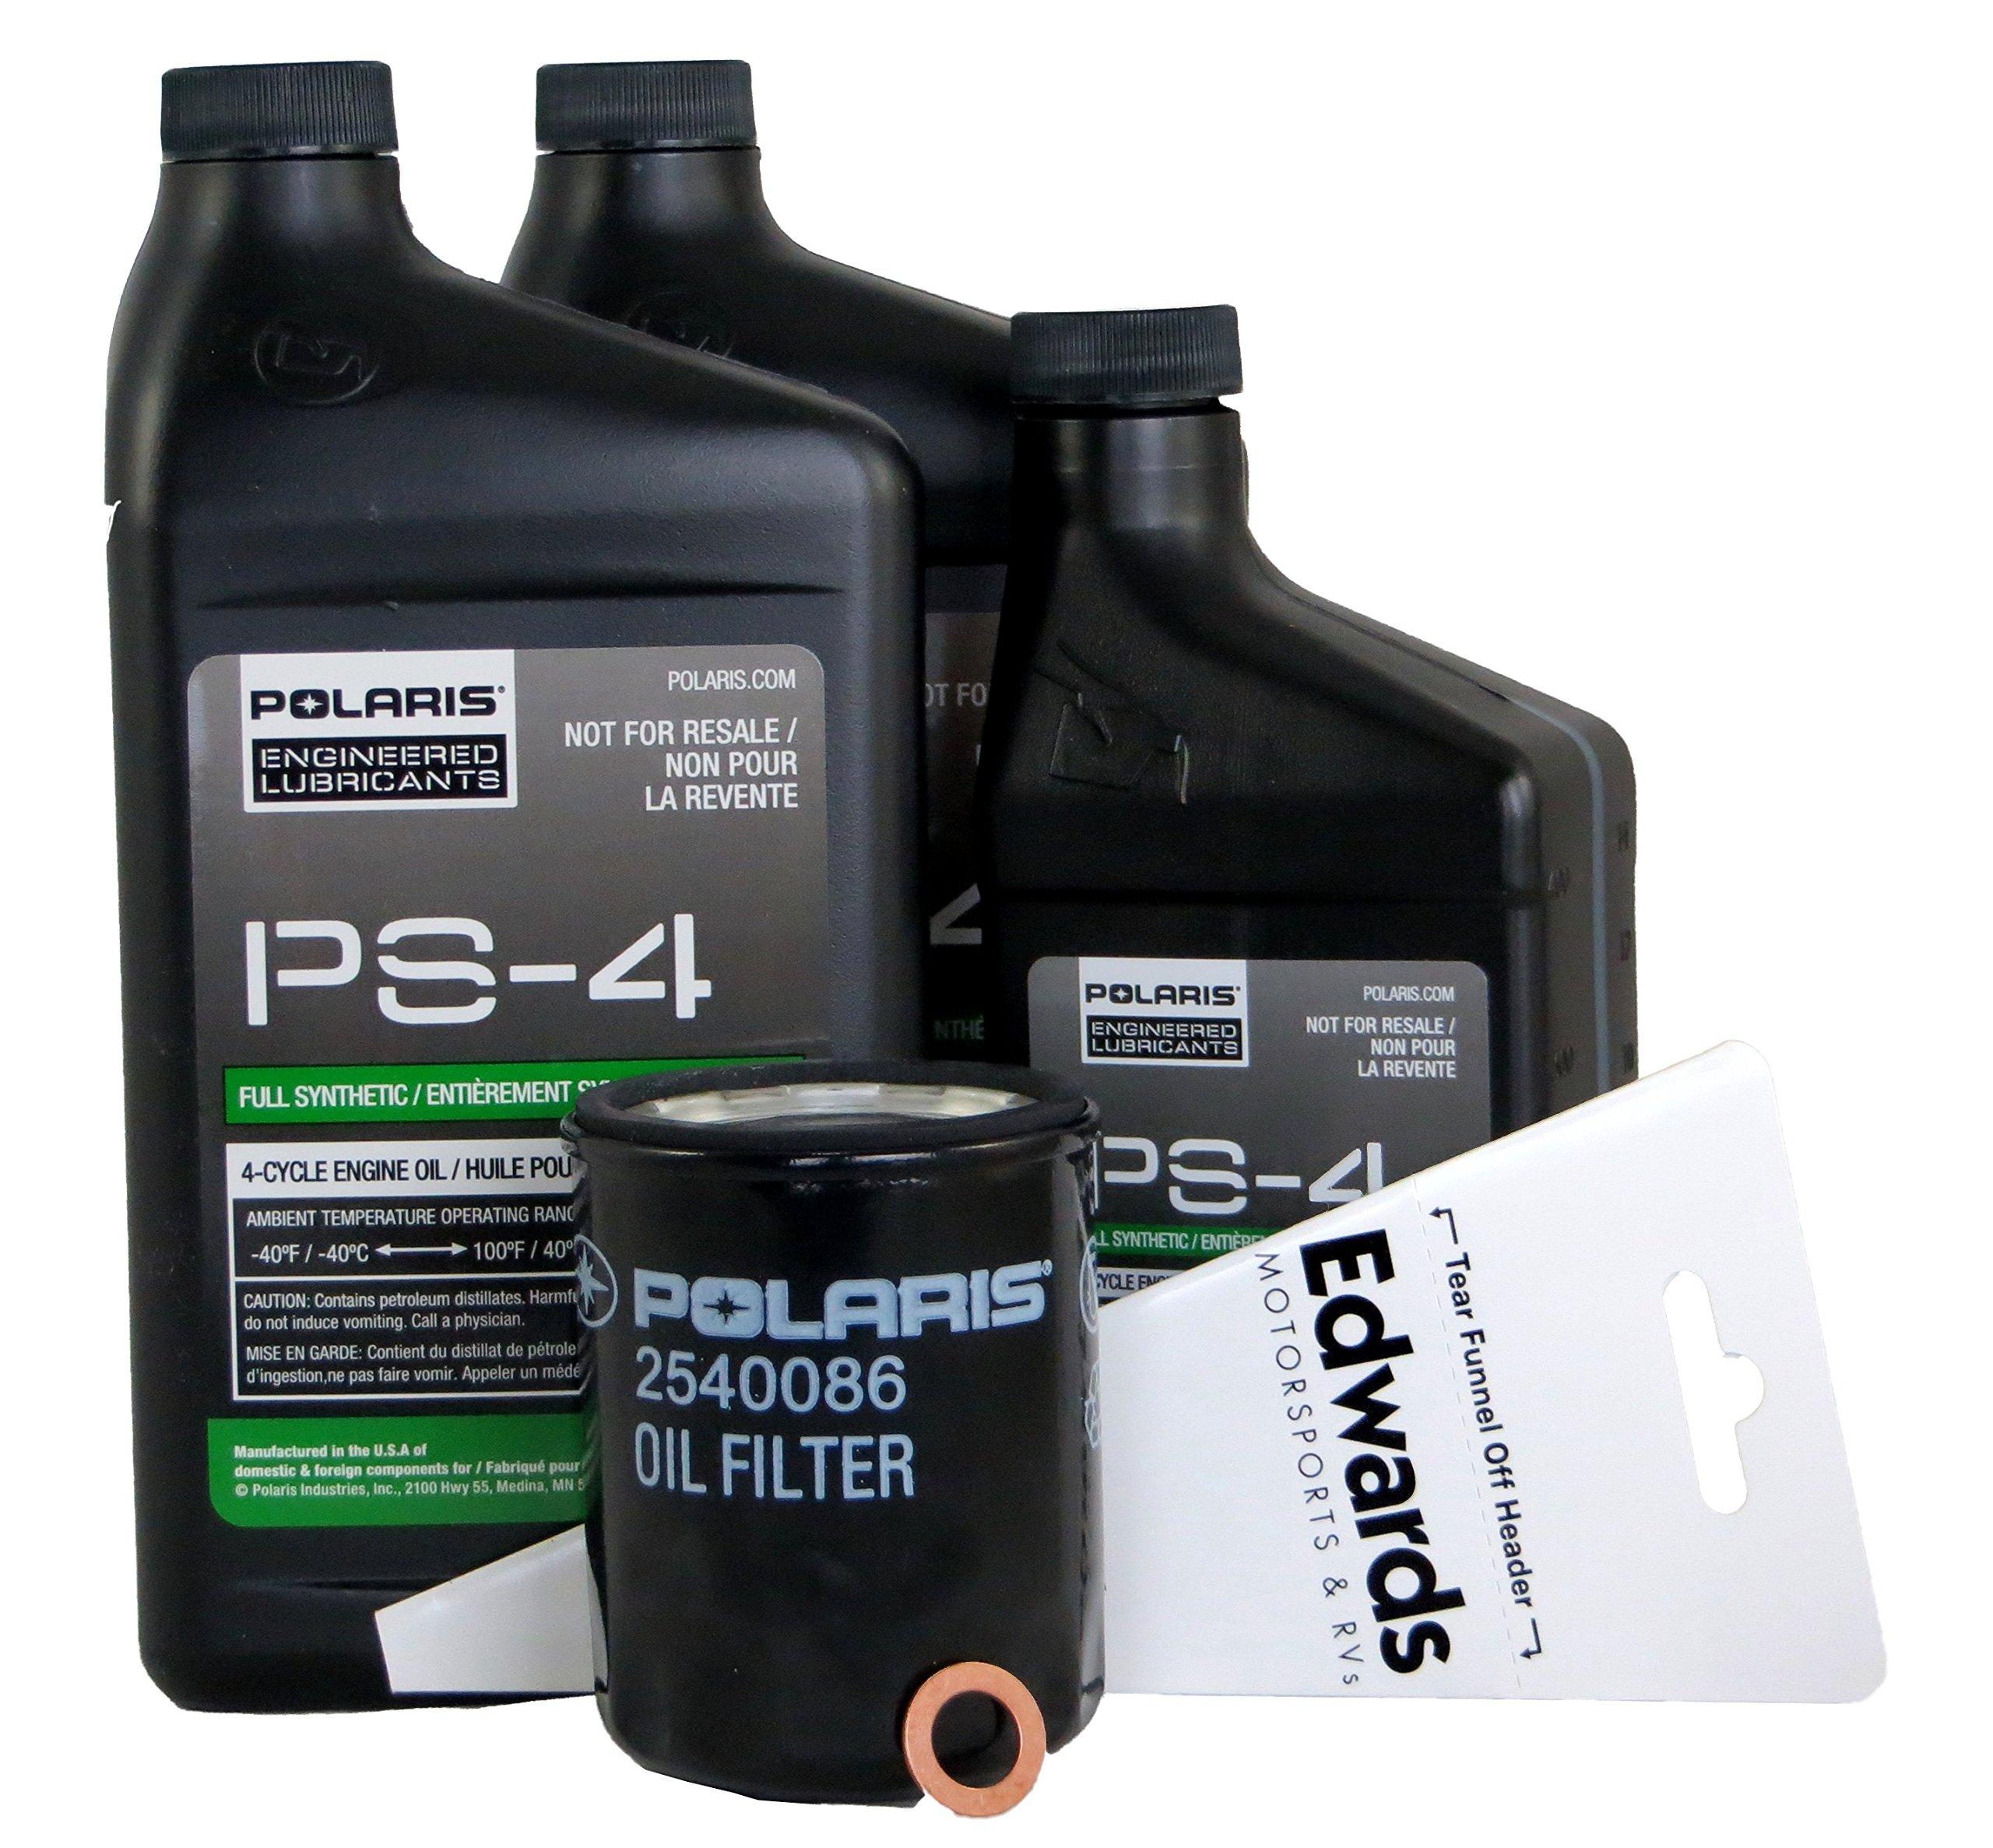 2018 POLARIS RZR XP 1000 RZR S 1000 OIL CHANGE KIT by Genuine Polaris